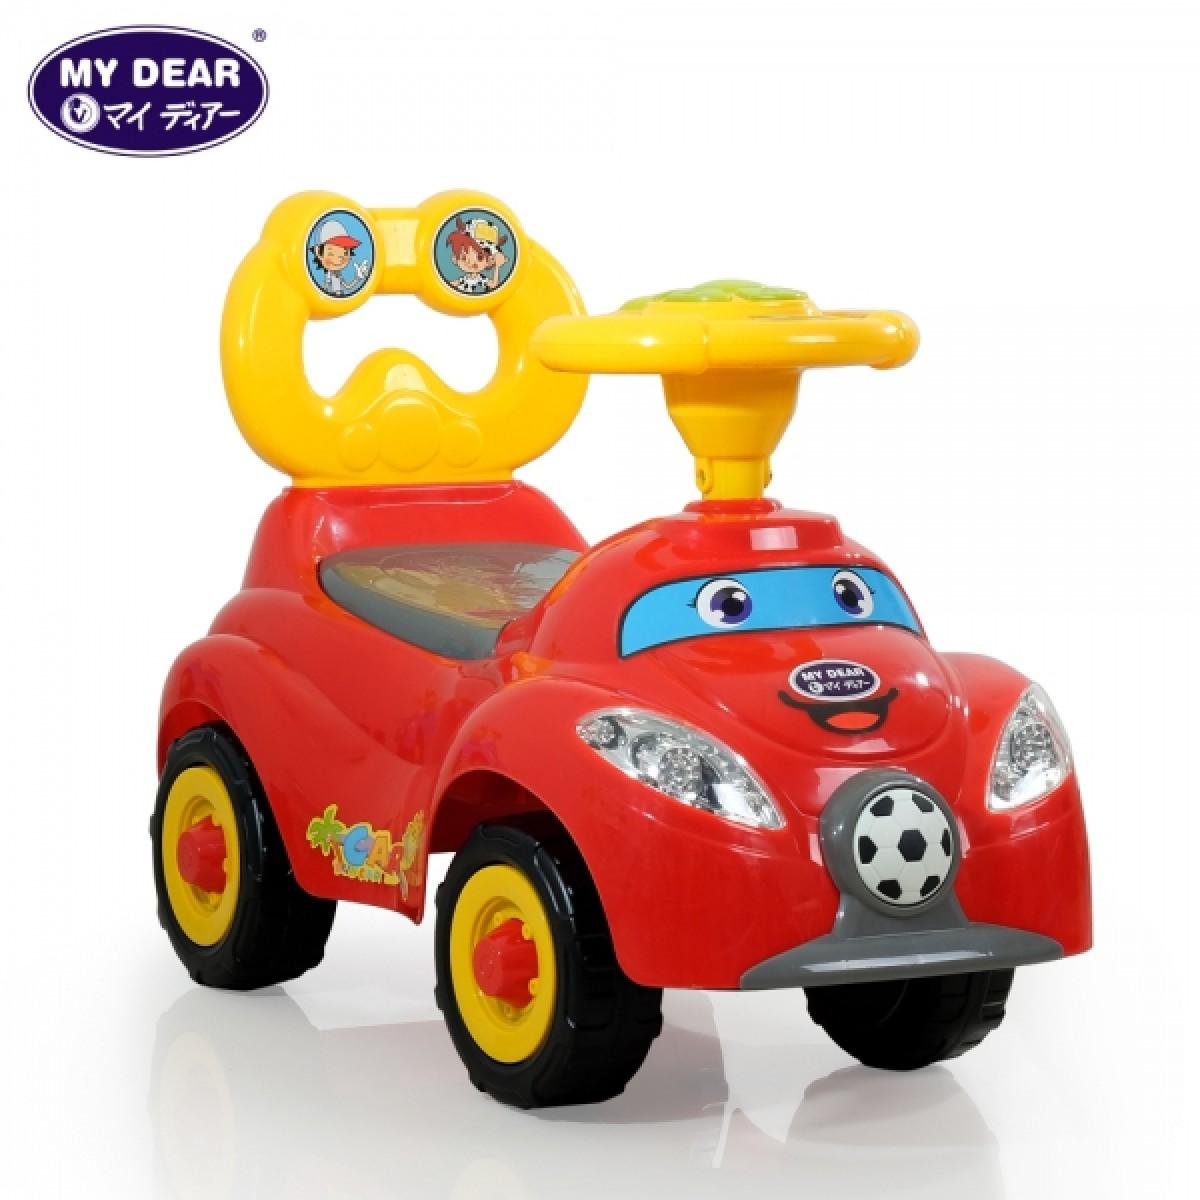 (SP1929) Ride-On-Car - Kico Baby Center